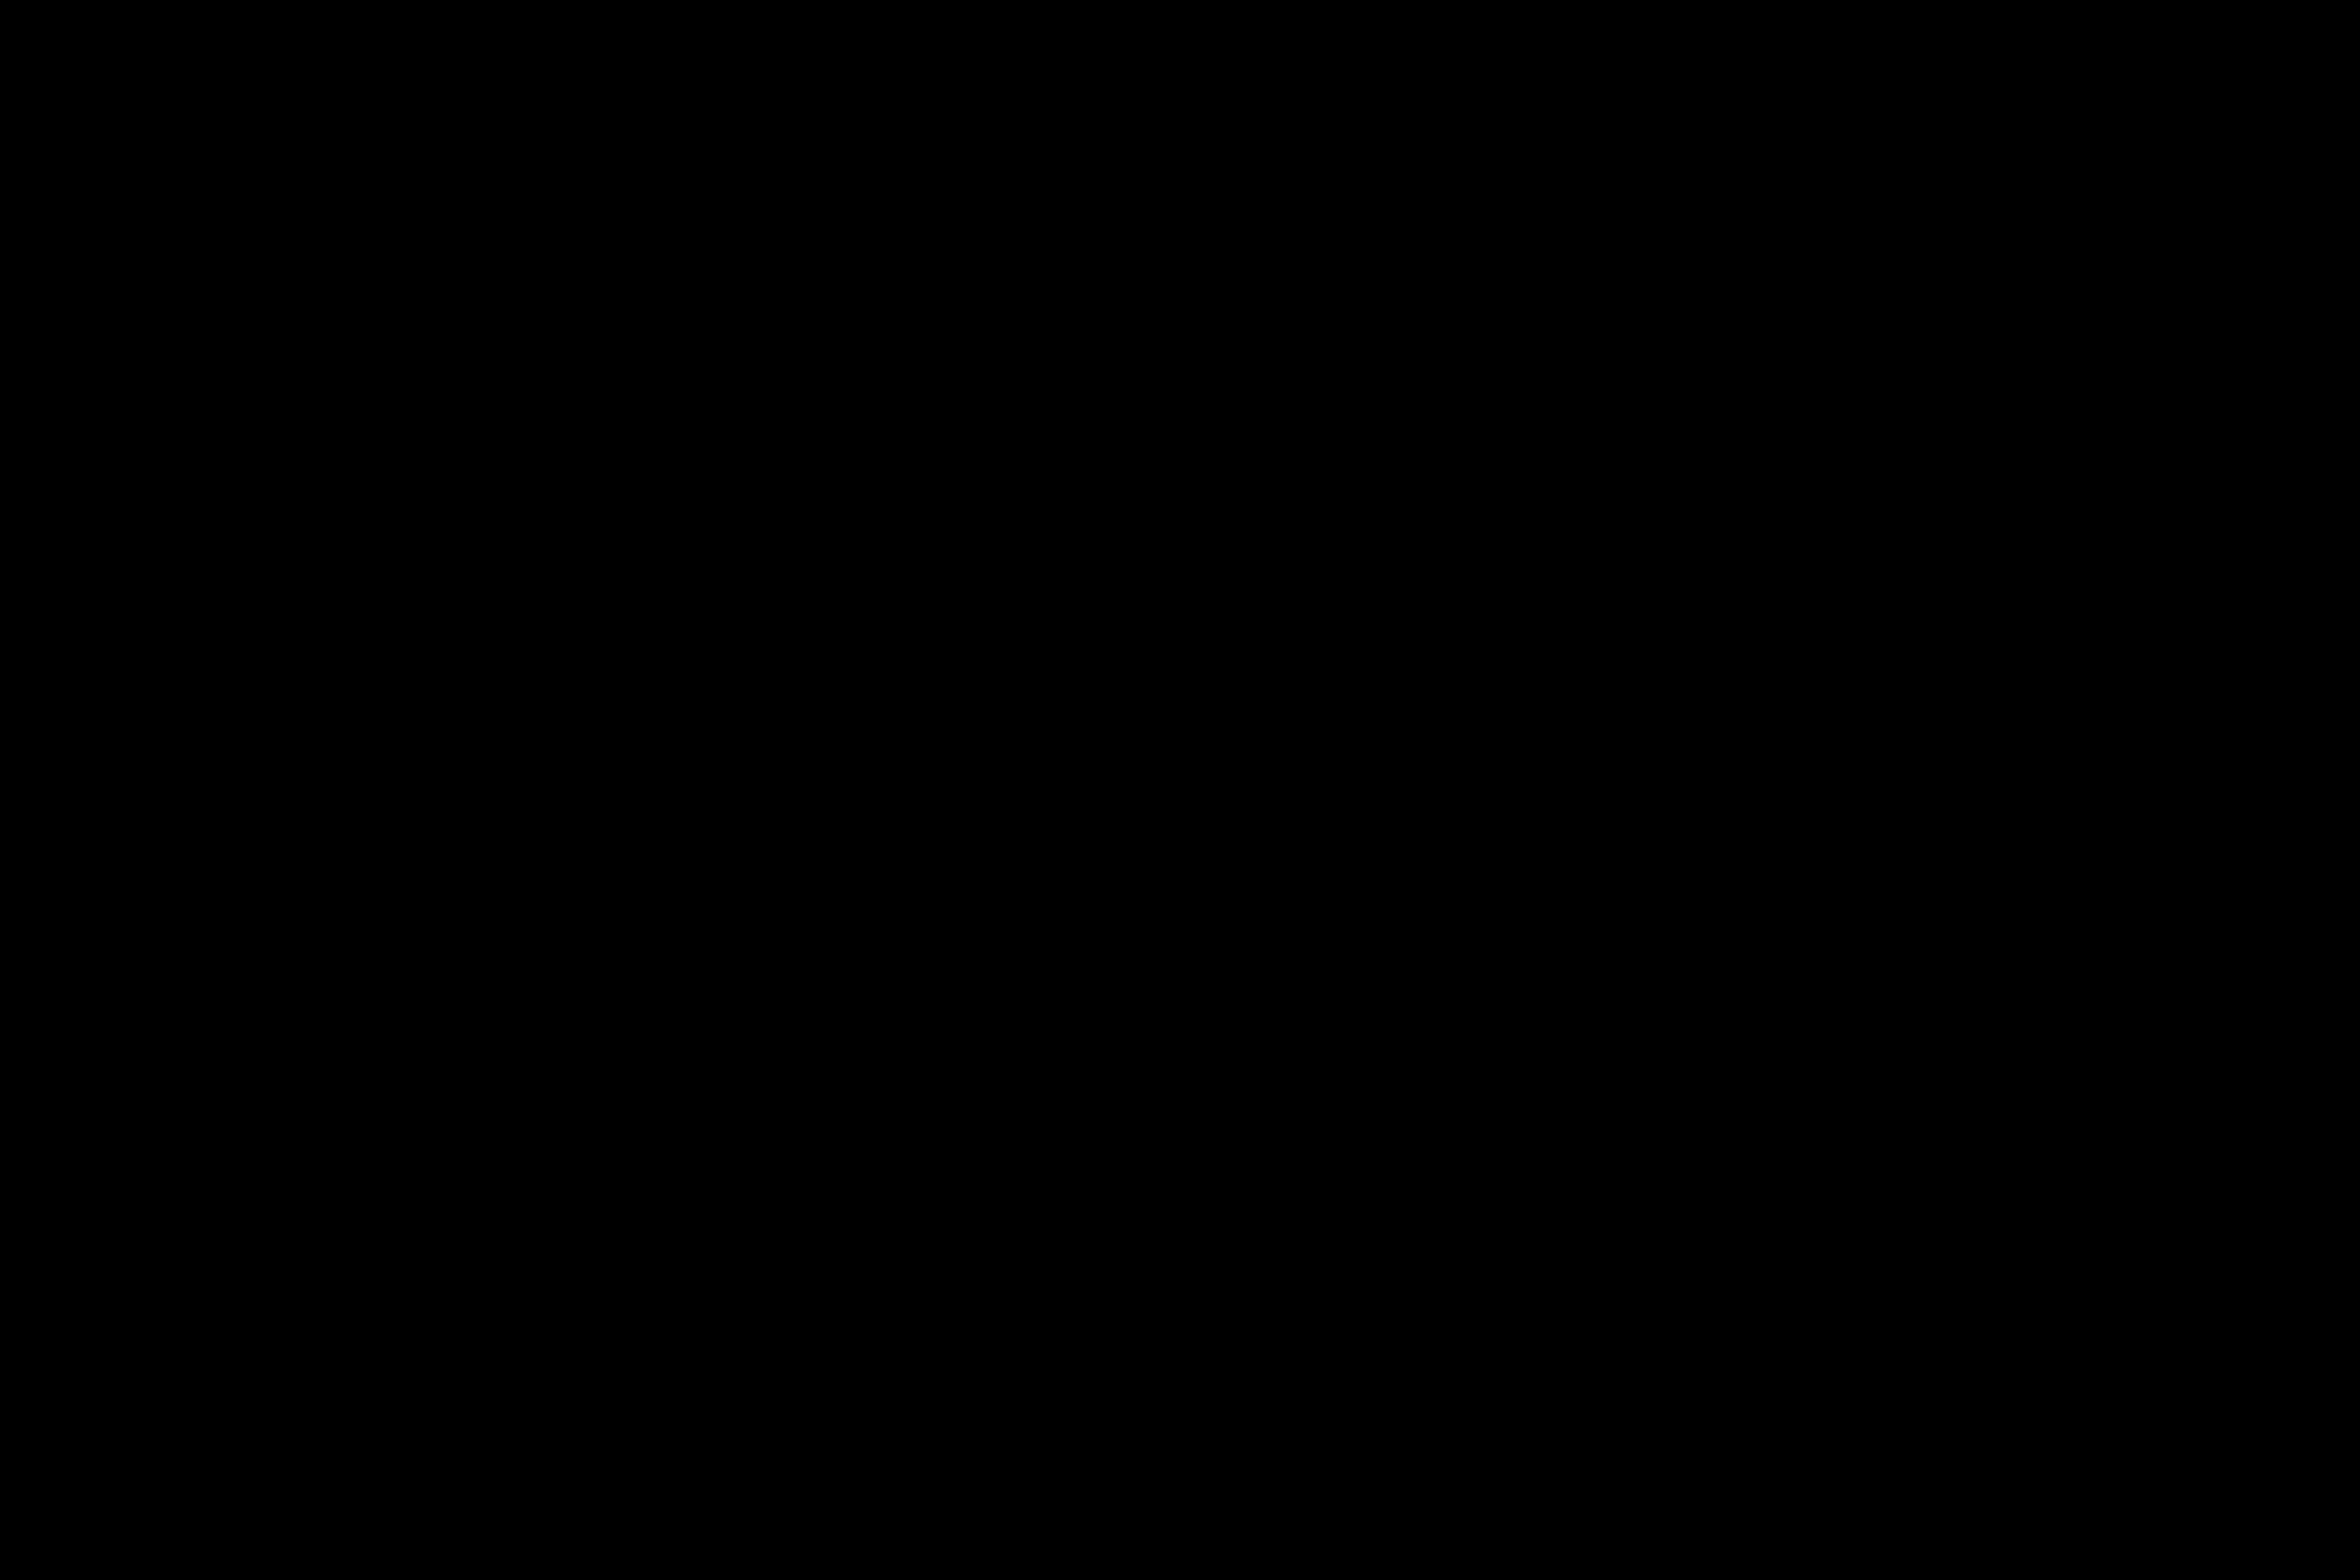 Leyenda 01 Beige